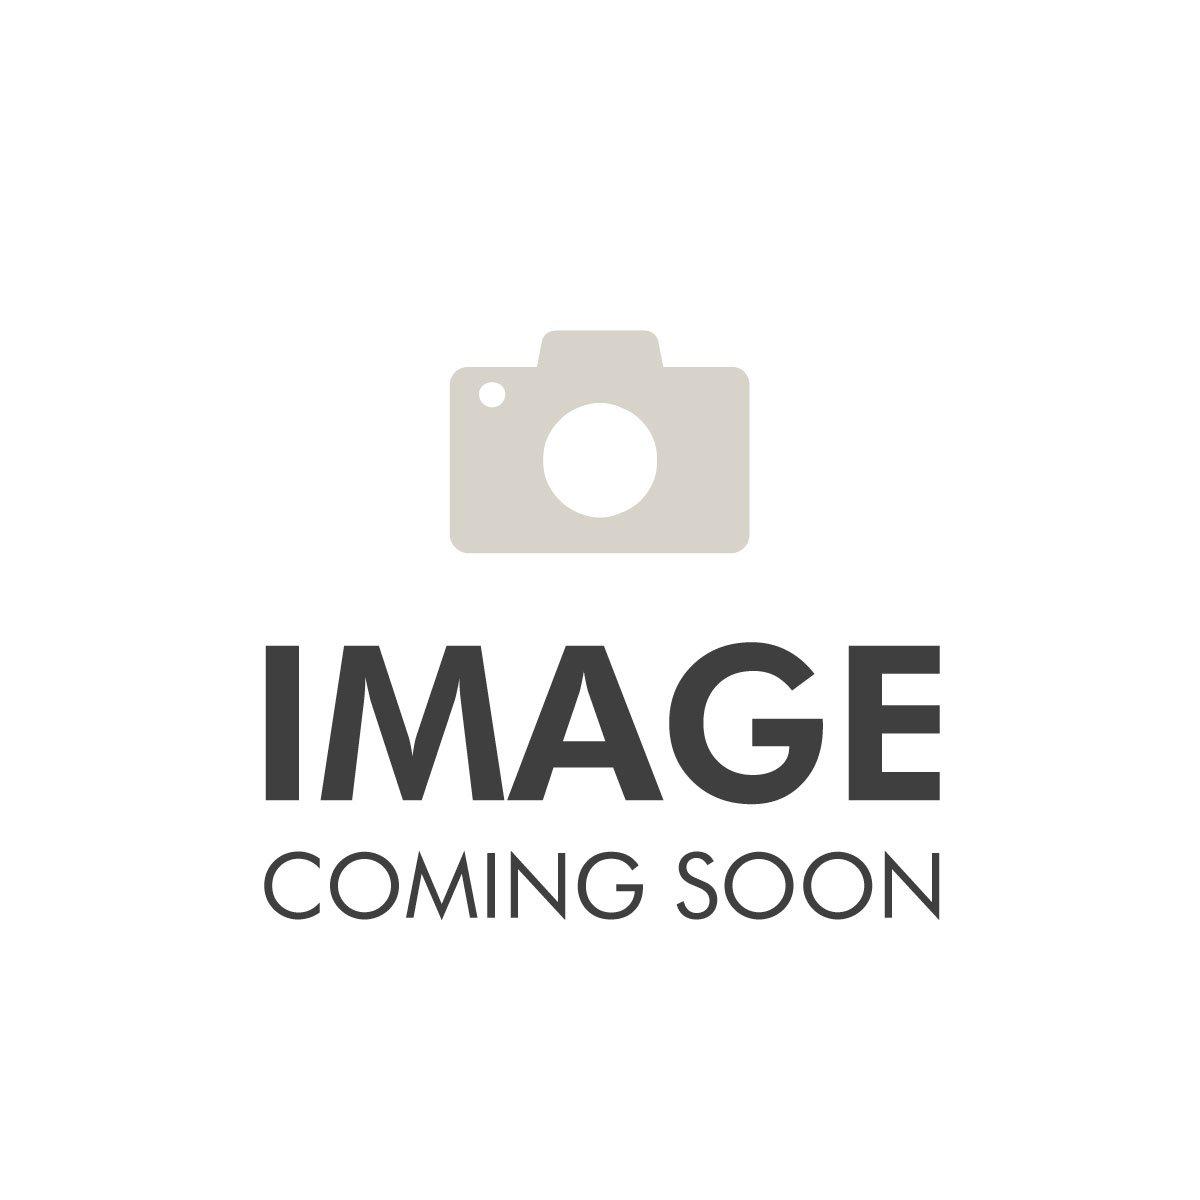 PBT - Epee Socket